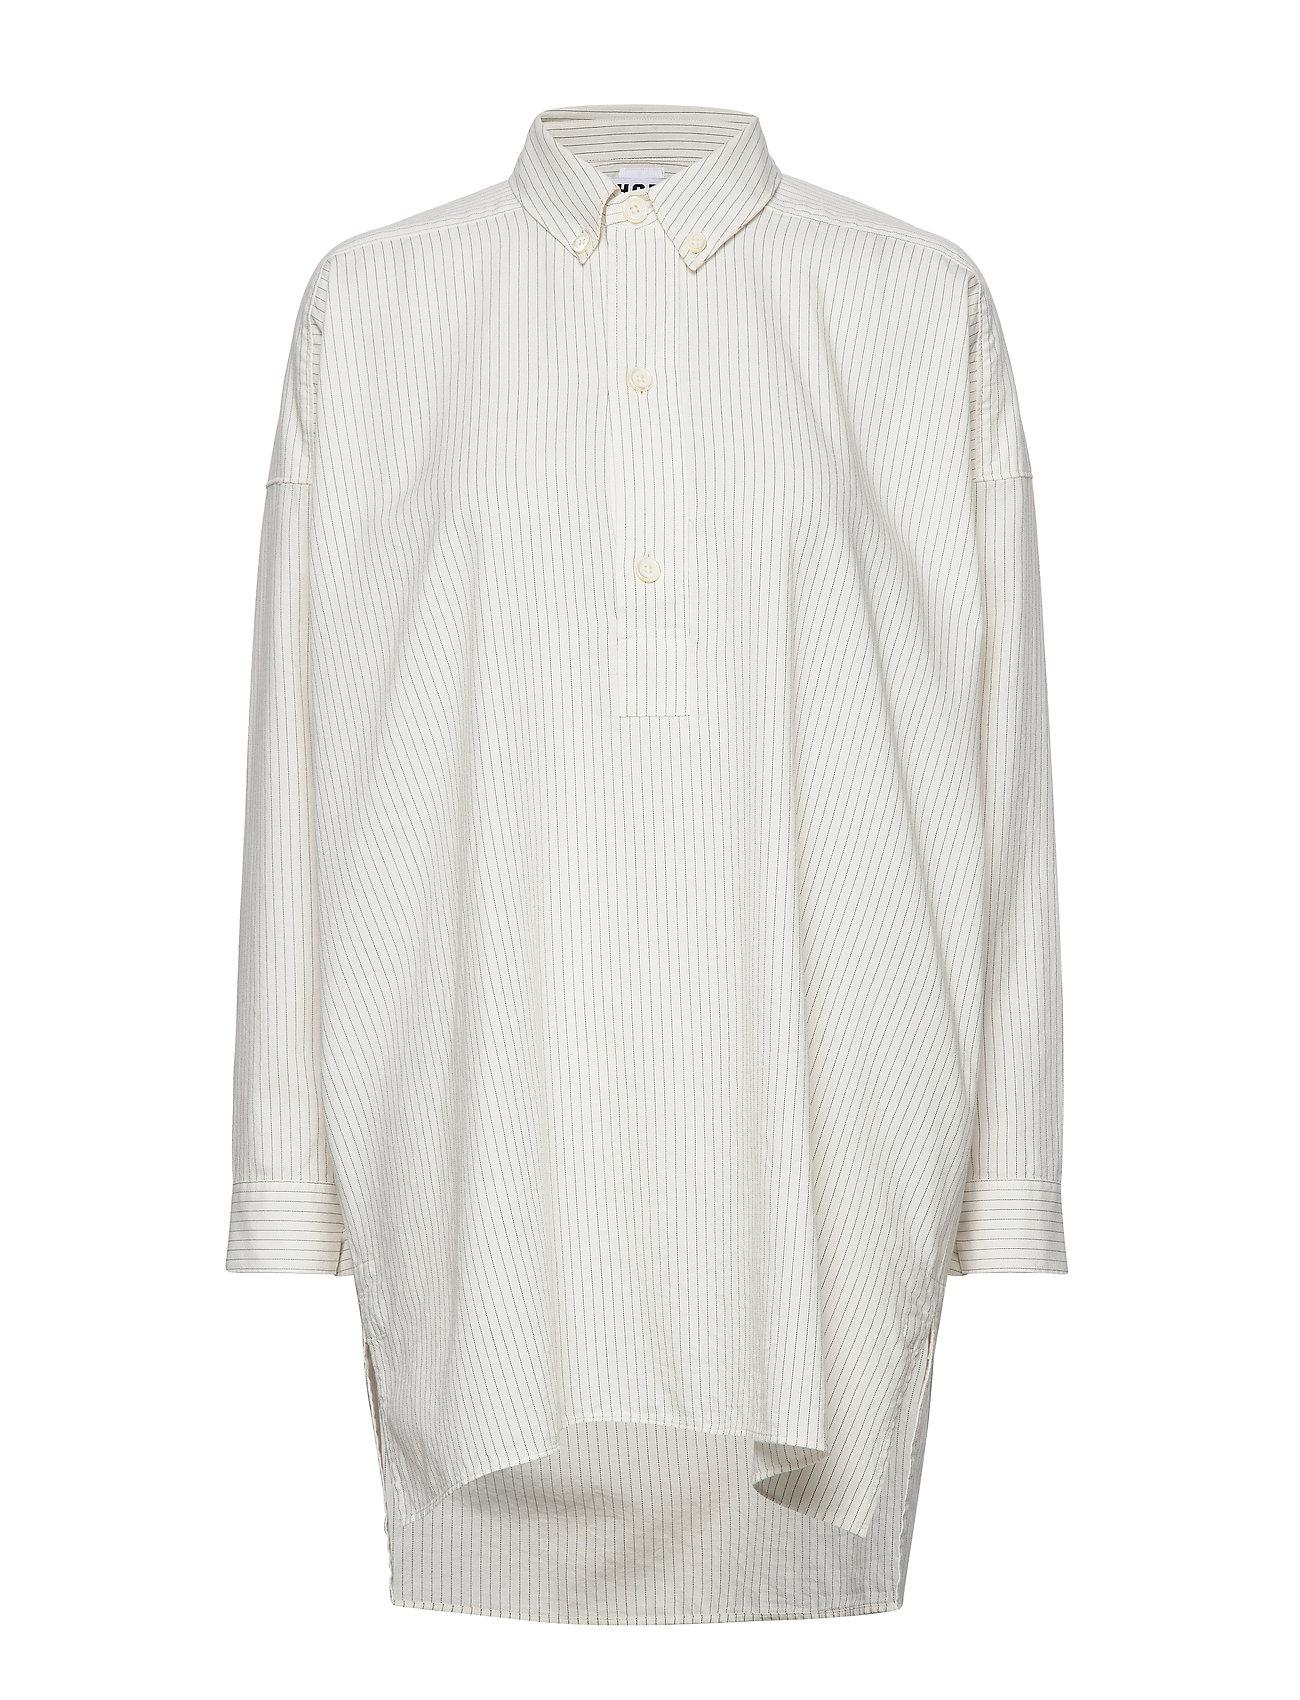 Hope Pitch Shirt - OFF WHITE PINSTRIPE